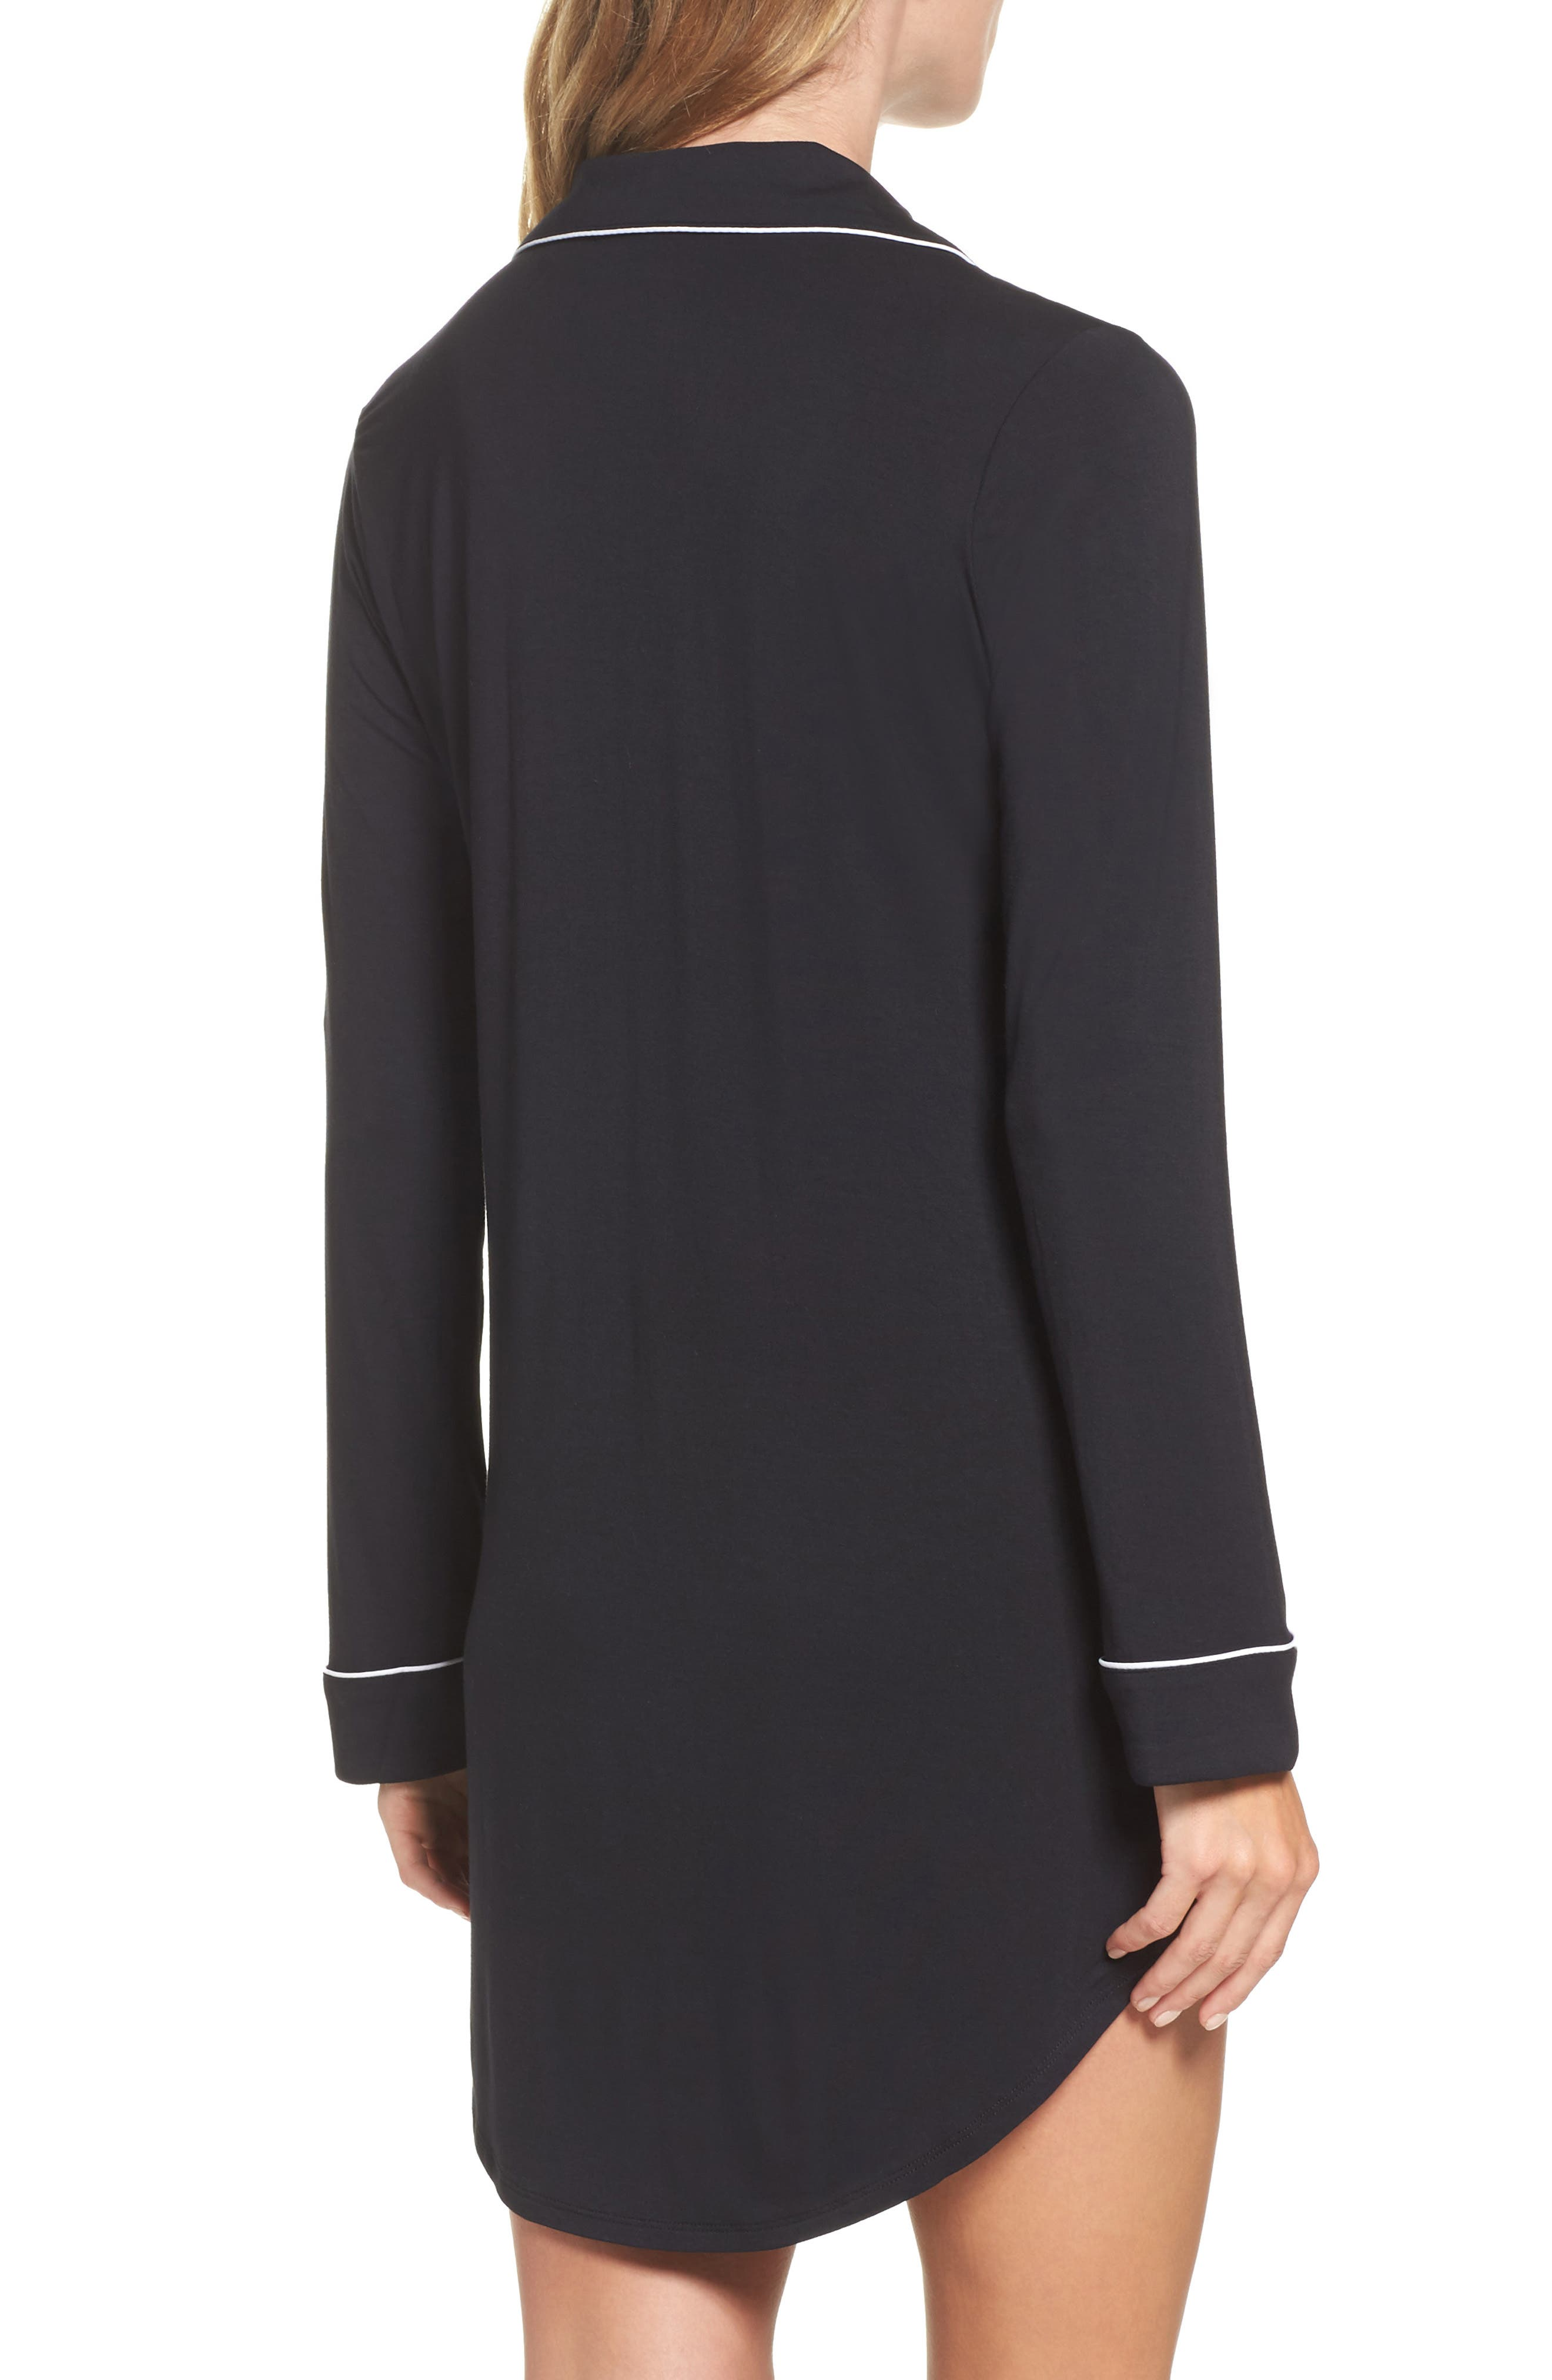 550f66db563 Sleepwear for Women